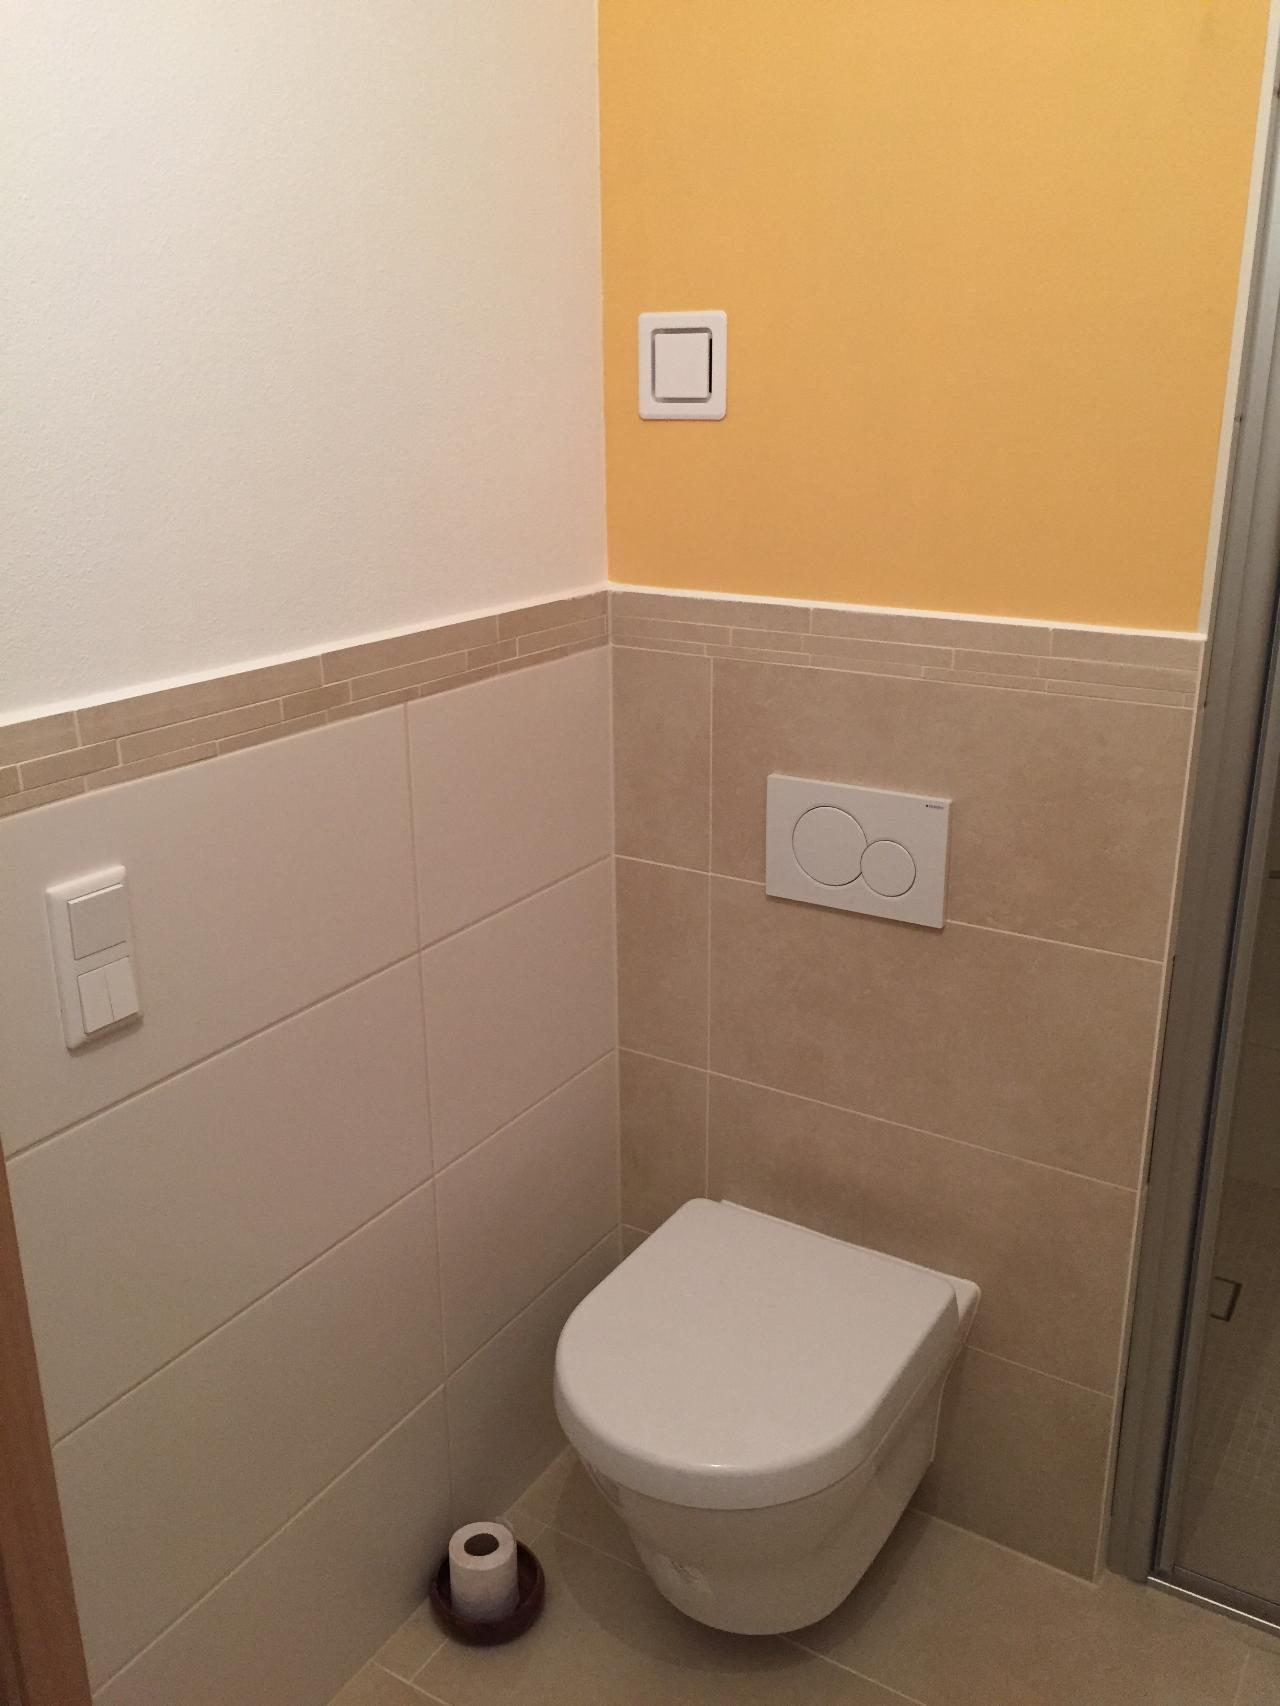 Belüftung in WC Verkleidung?  Bauforum auf energiesparhaus.at